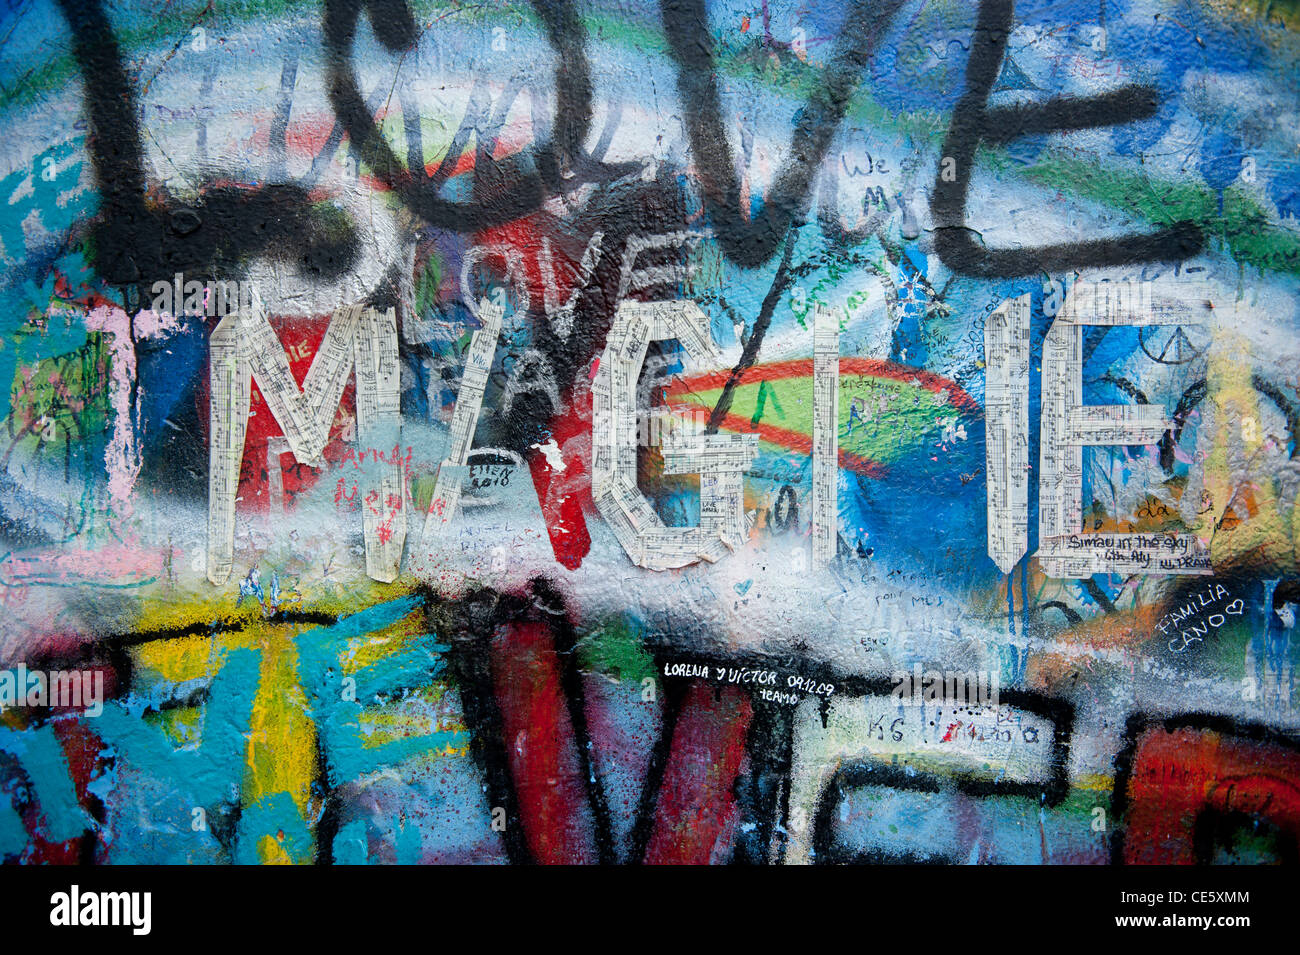 John Lennon homenaje en la pared de la Mala Strana parte de la ciudad vieja en Praga, República Checa Foto de stock